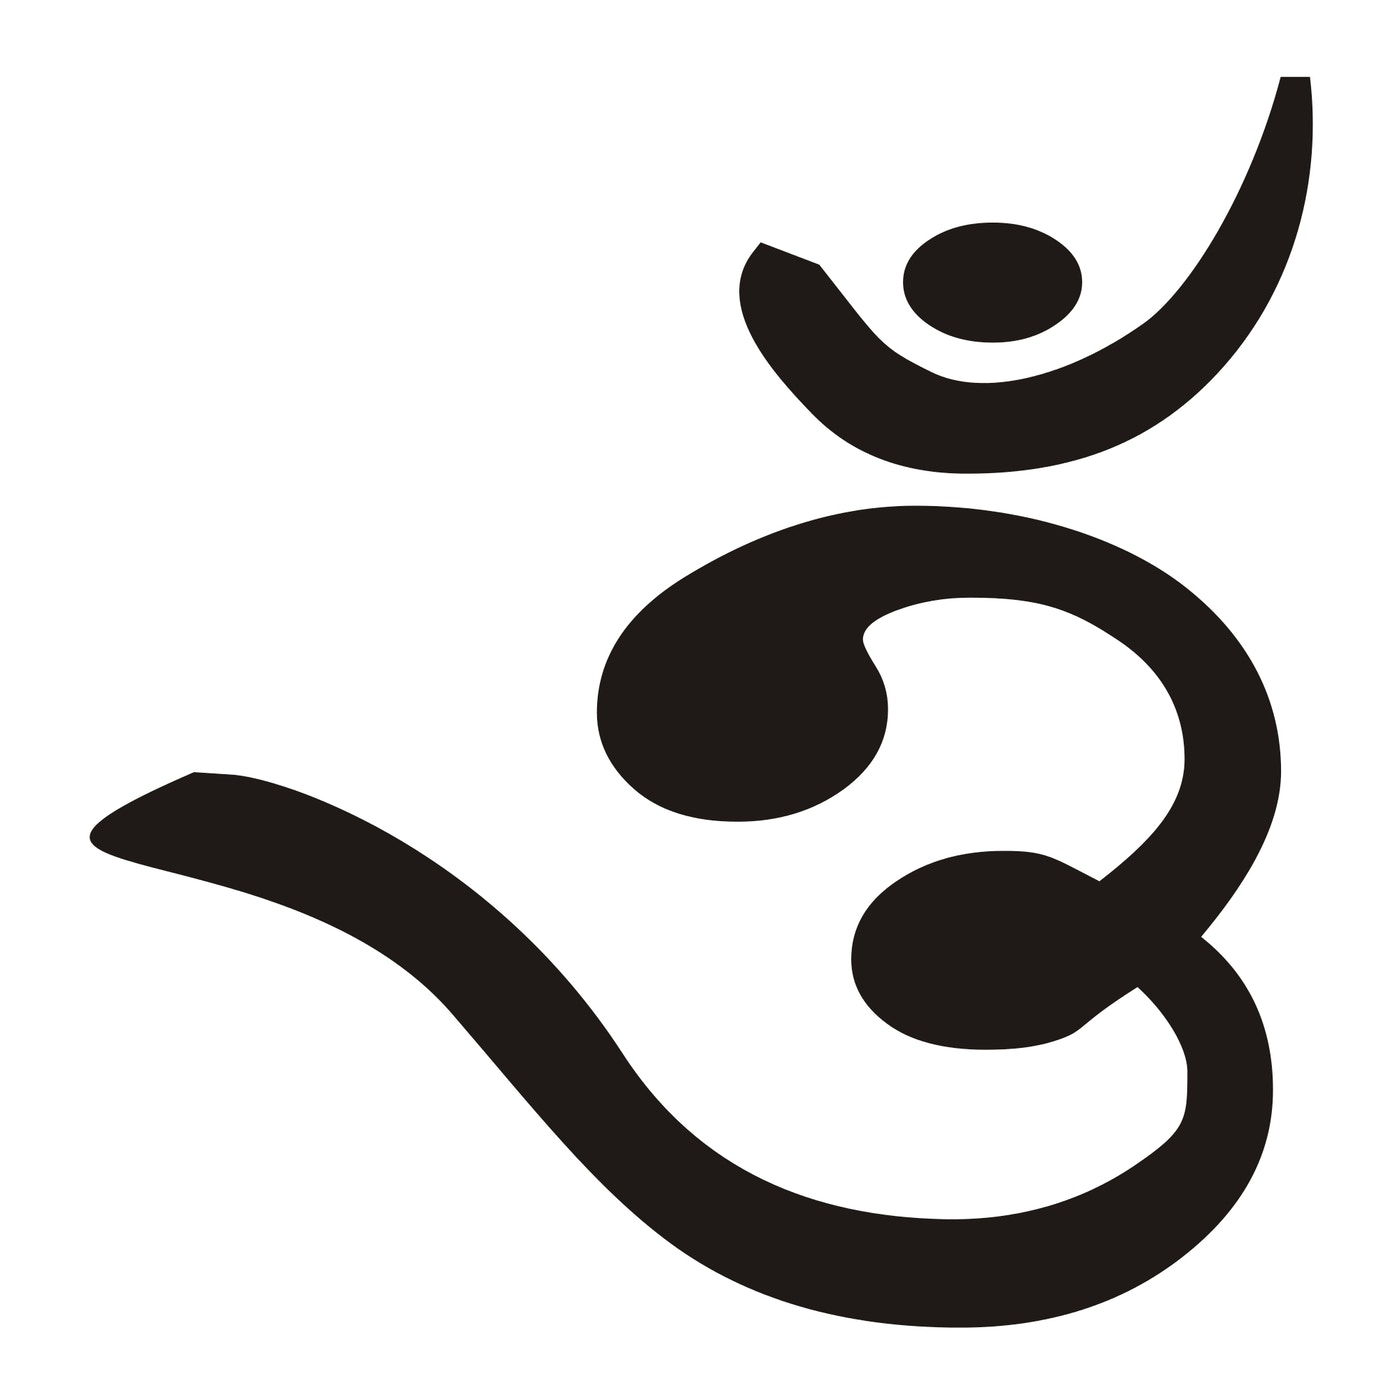 Om/Aum - ReligionFacts